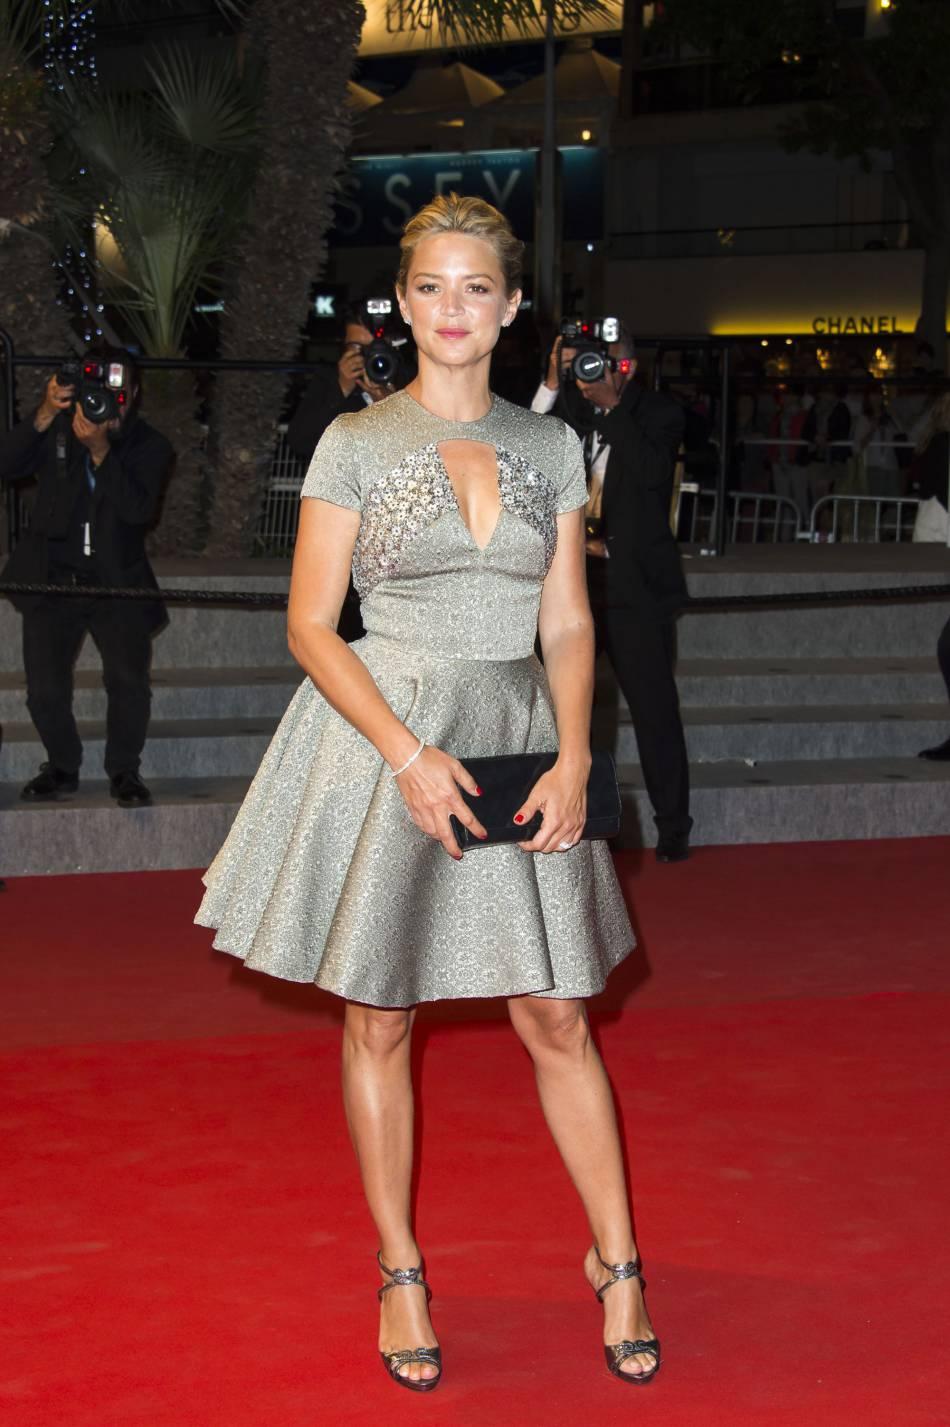 Virginie Efira et un look baby doll lors du Festivalde Cannes en 2015.